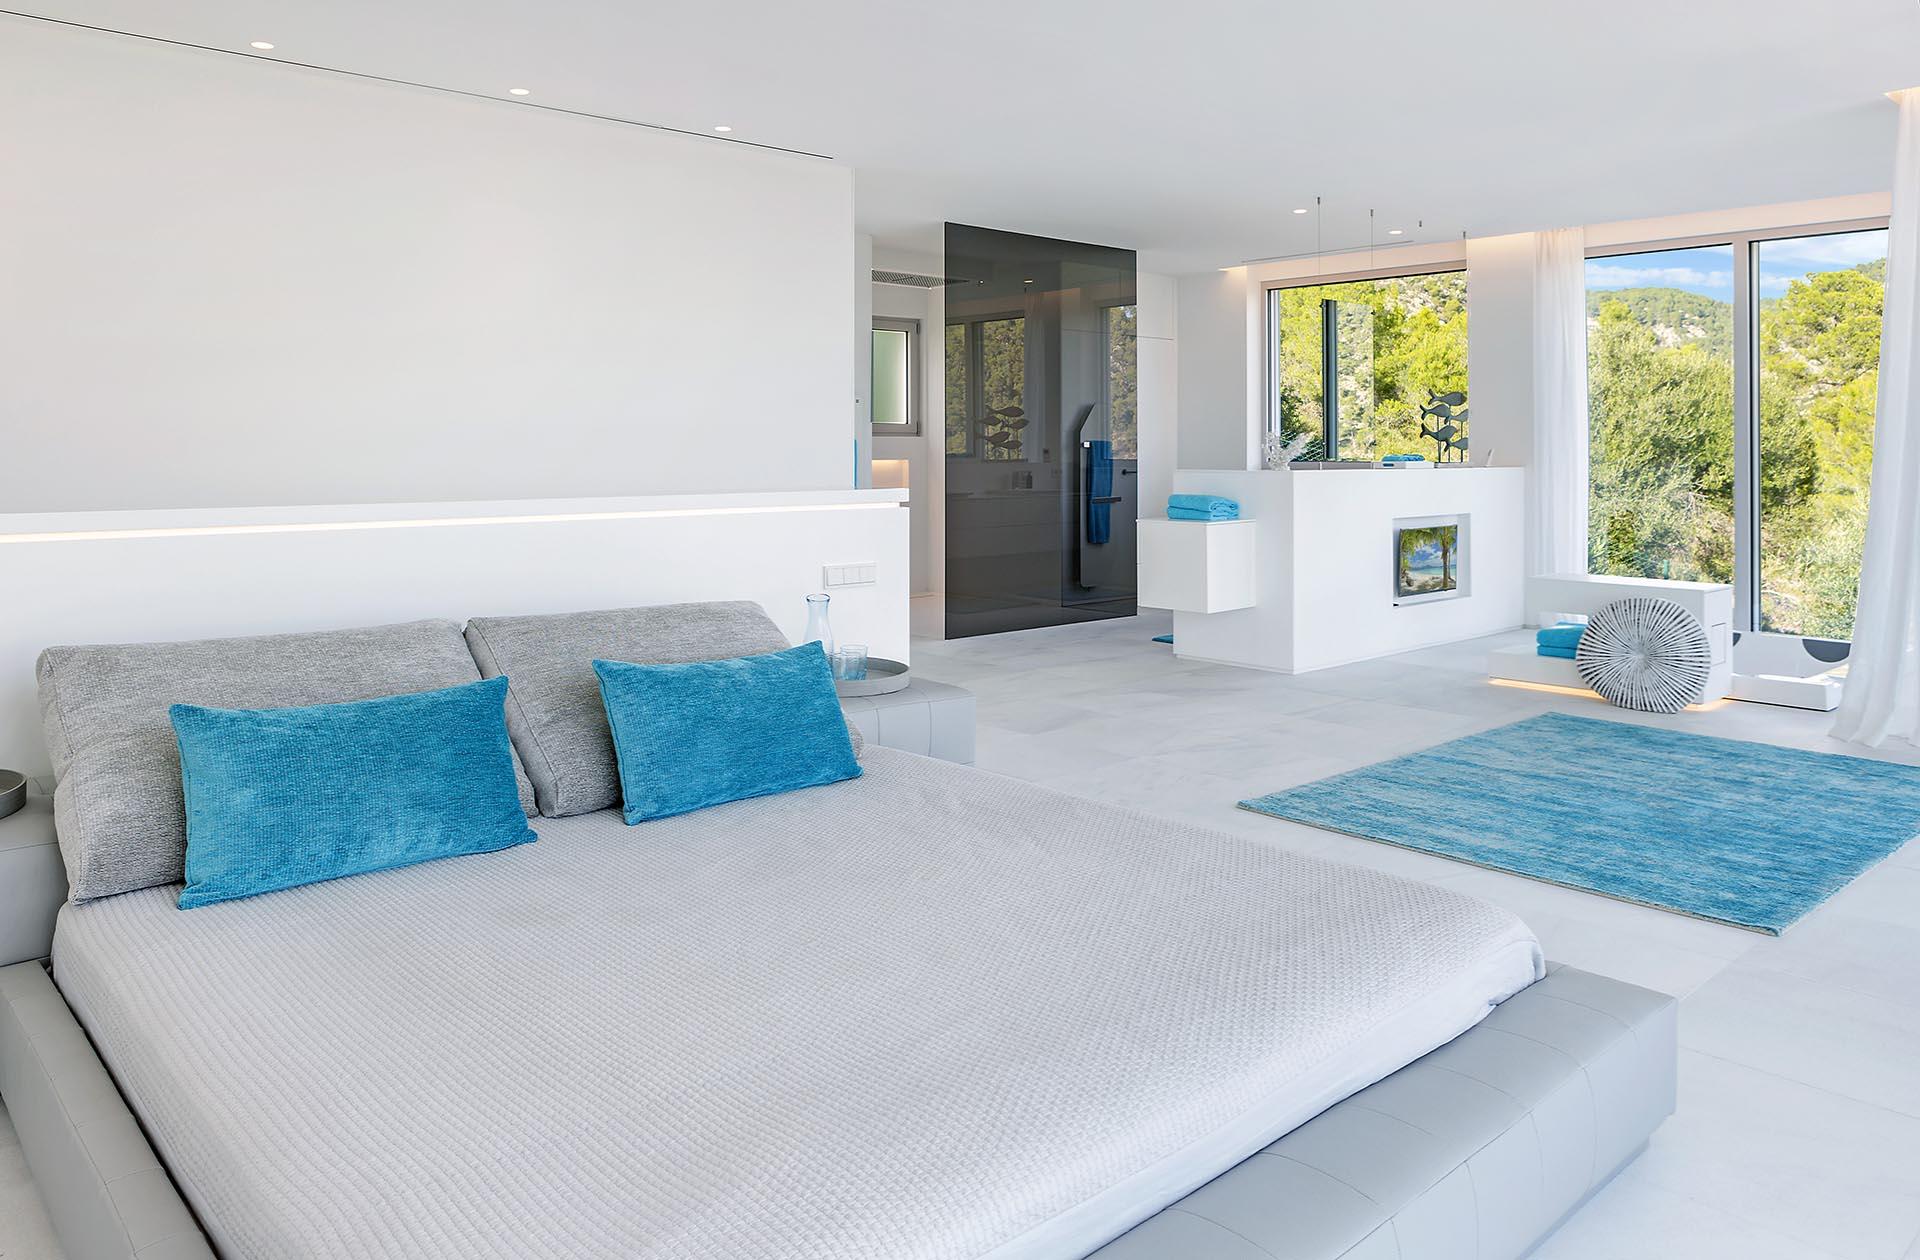 Beautiful modern villa in Costa den Blanes - Mediterranean bedroom